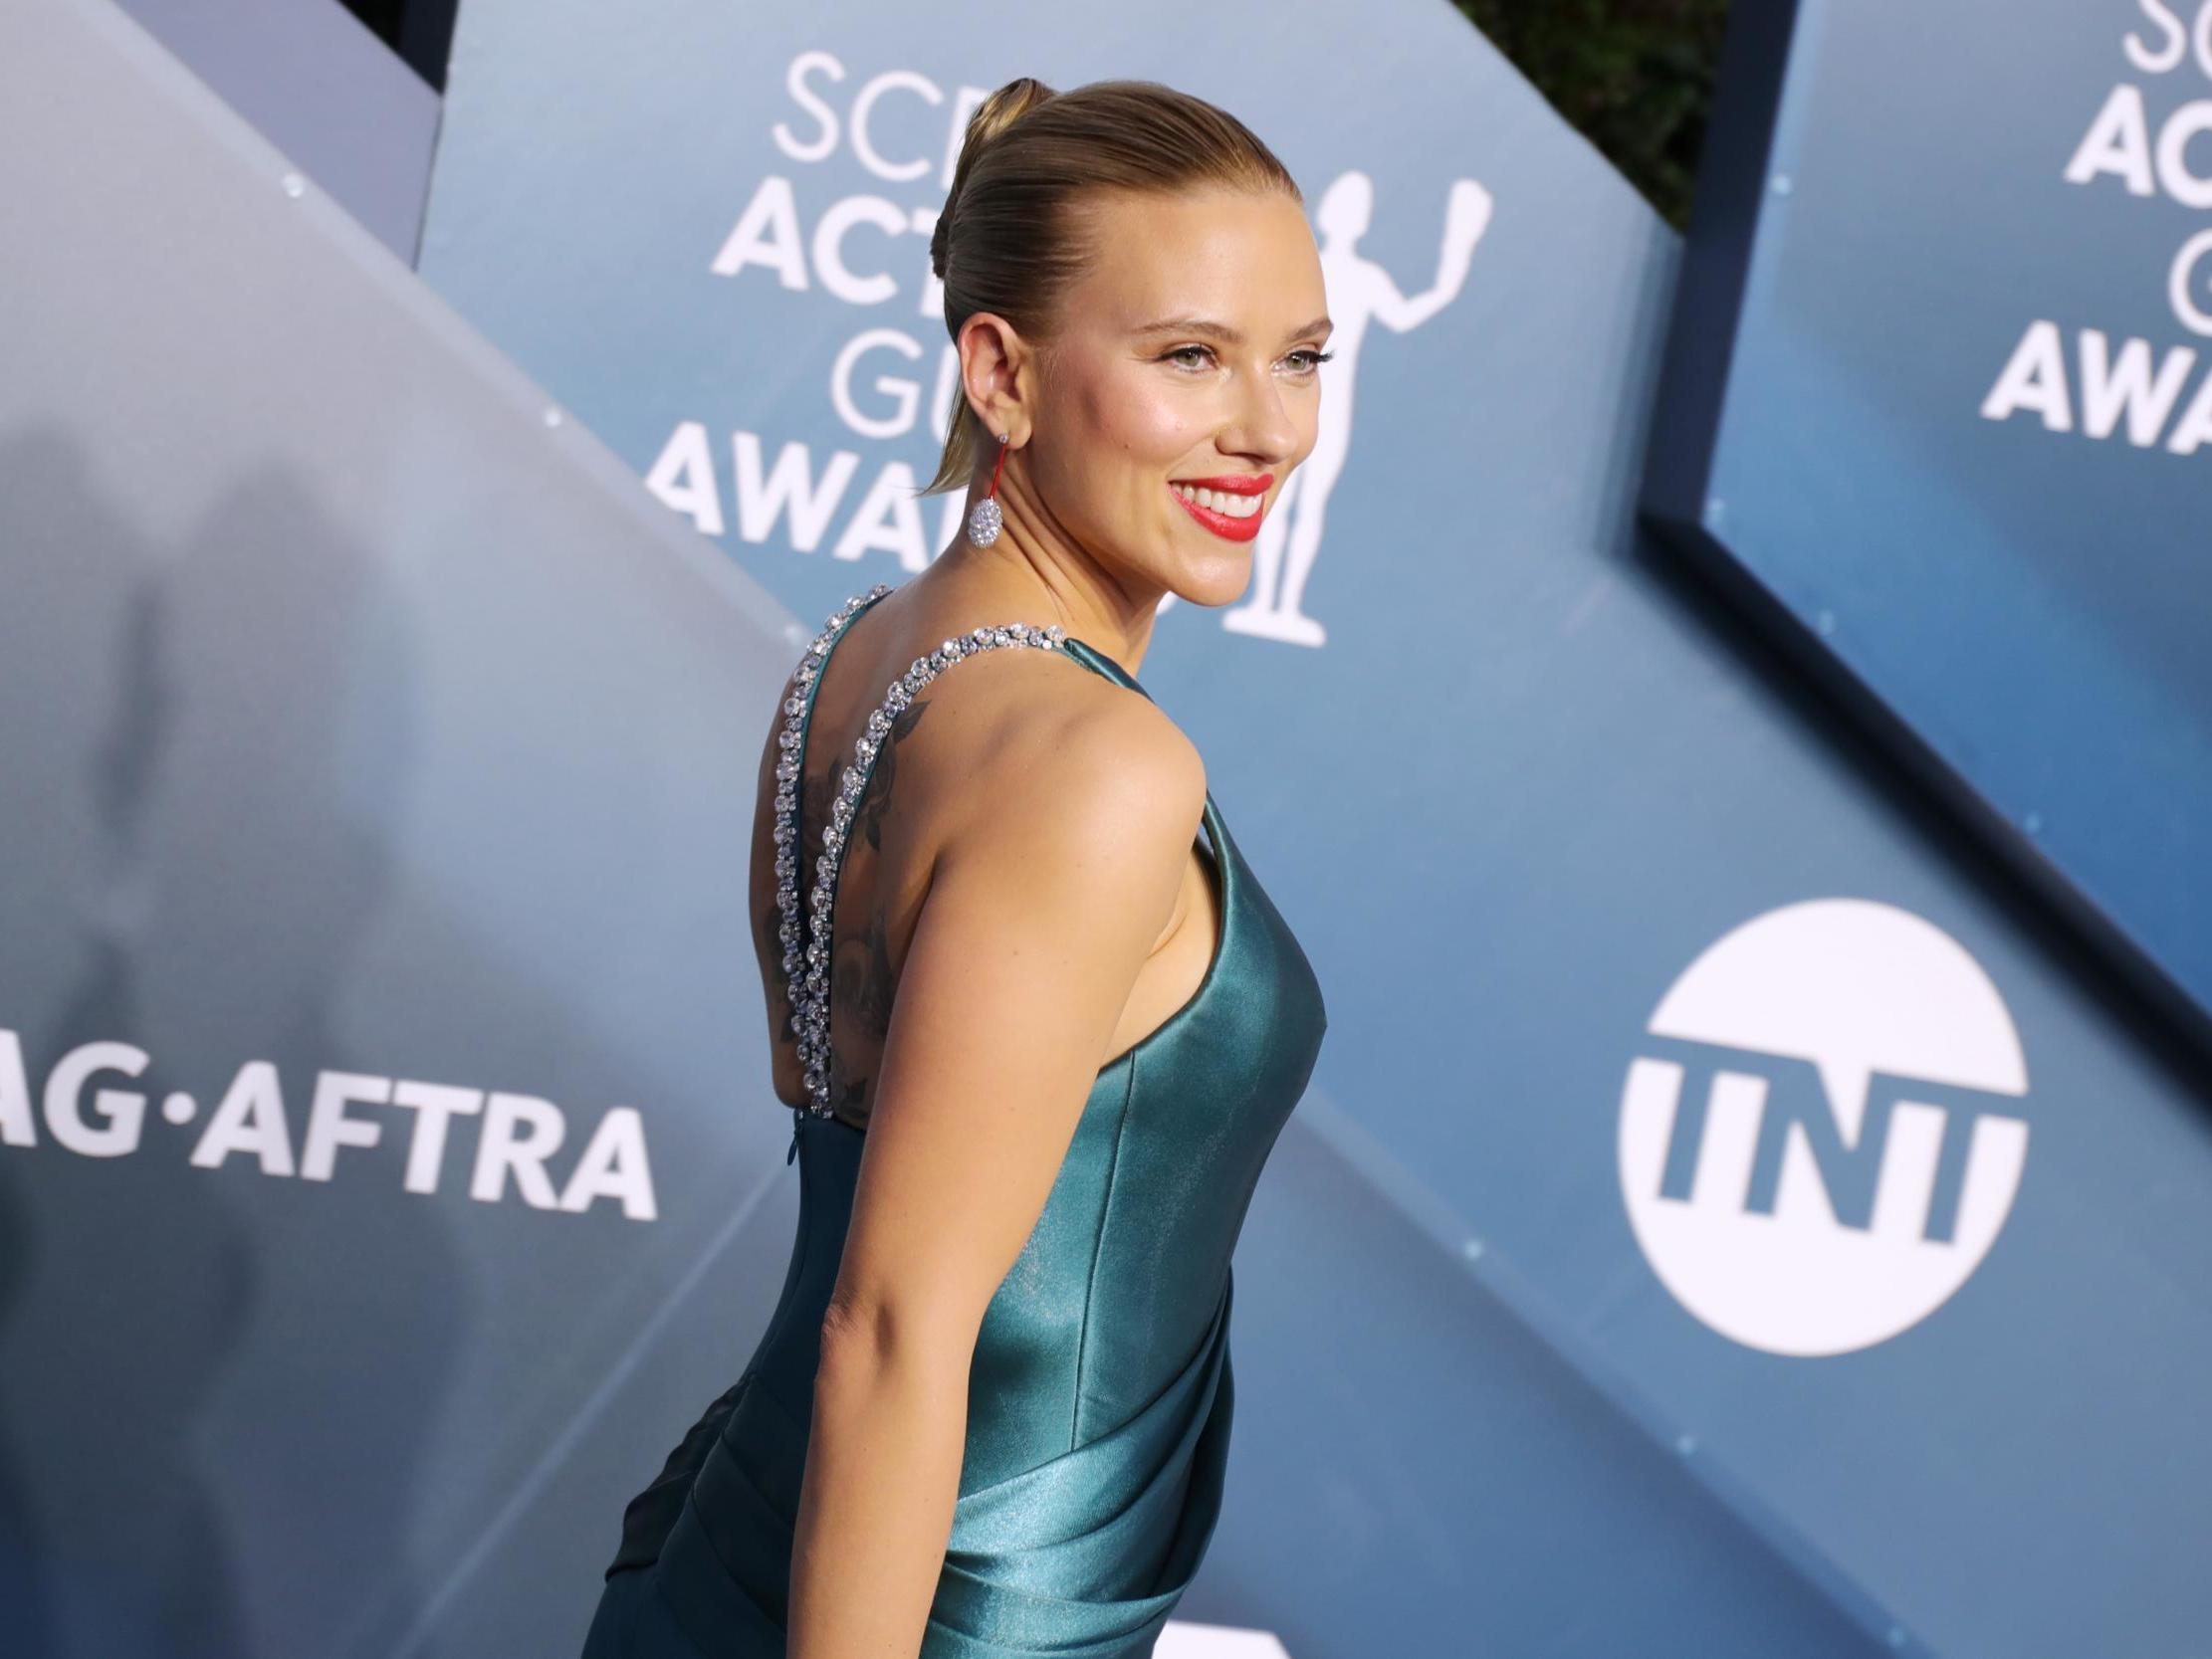 SAG Awards 2020: Jennifer Aniston and Scarlett Johansson among best-dressed stars on red carpet